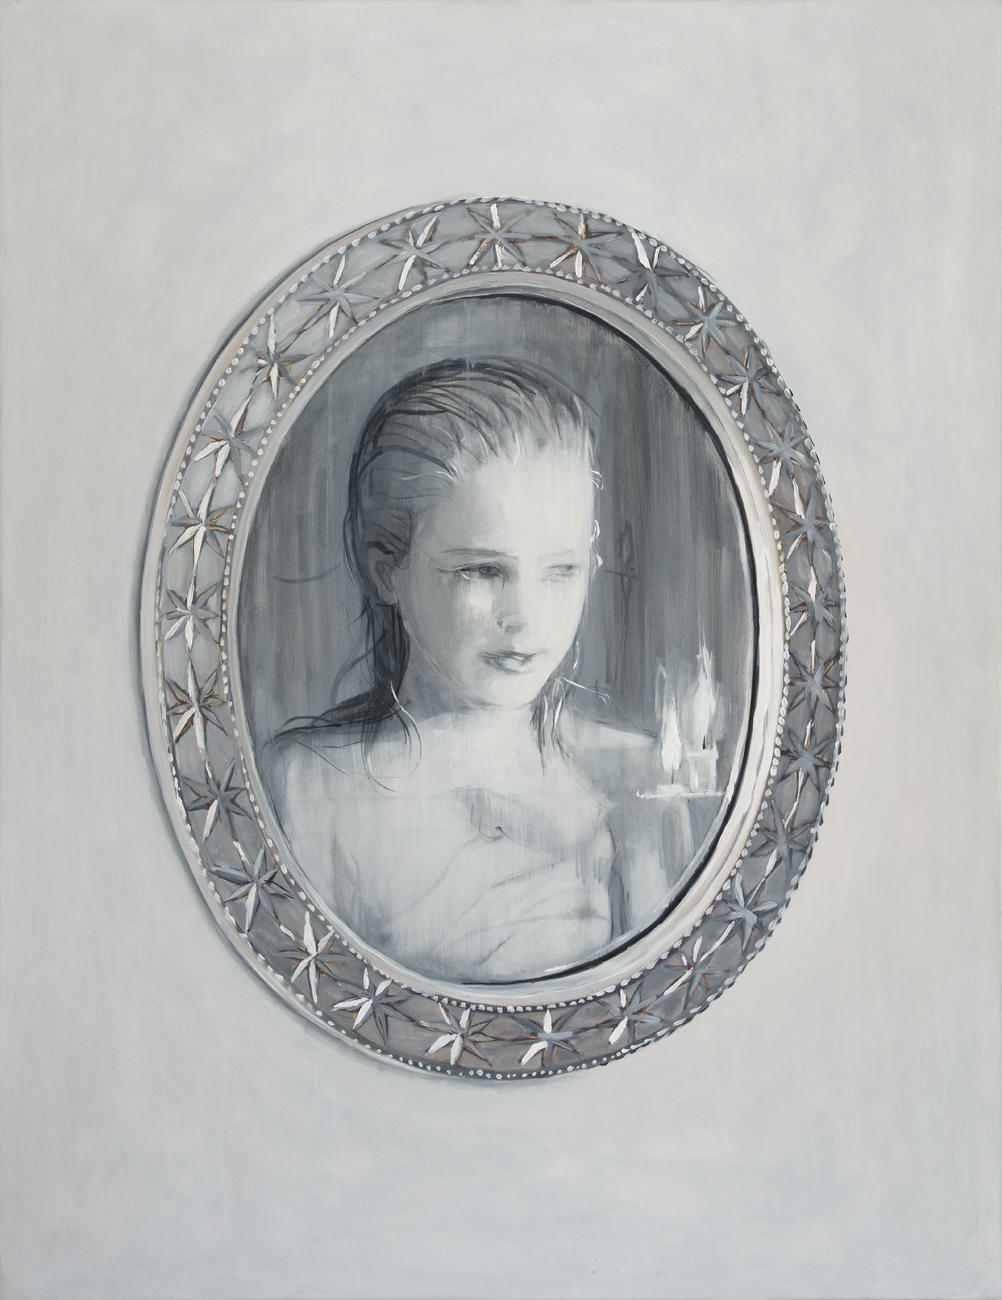 Ylva Ogland  Ylva/Mirrored Ylva  2007-8 Diptych, oil on canvas 100 x 150 cm, respective 88 x 67 cm